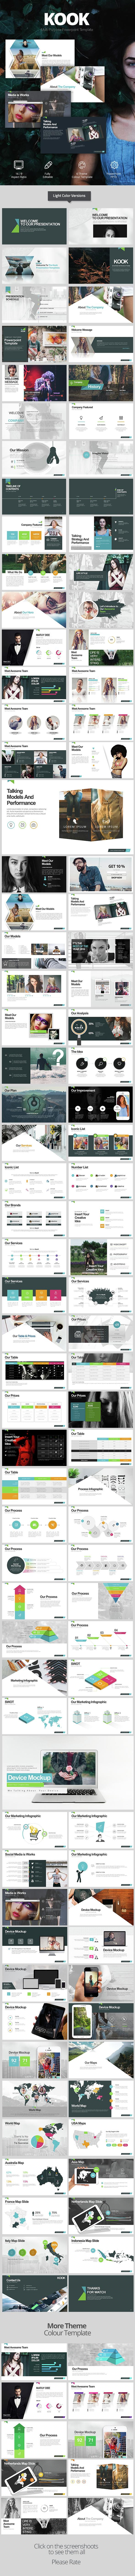 KooK Powerpoint Presentation - Creative PowerPoint Templates